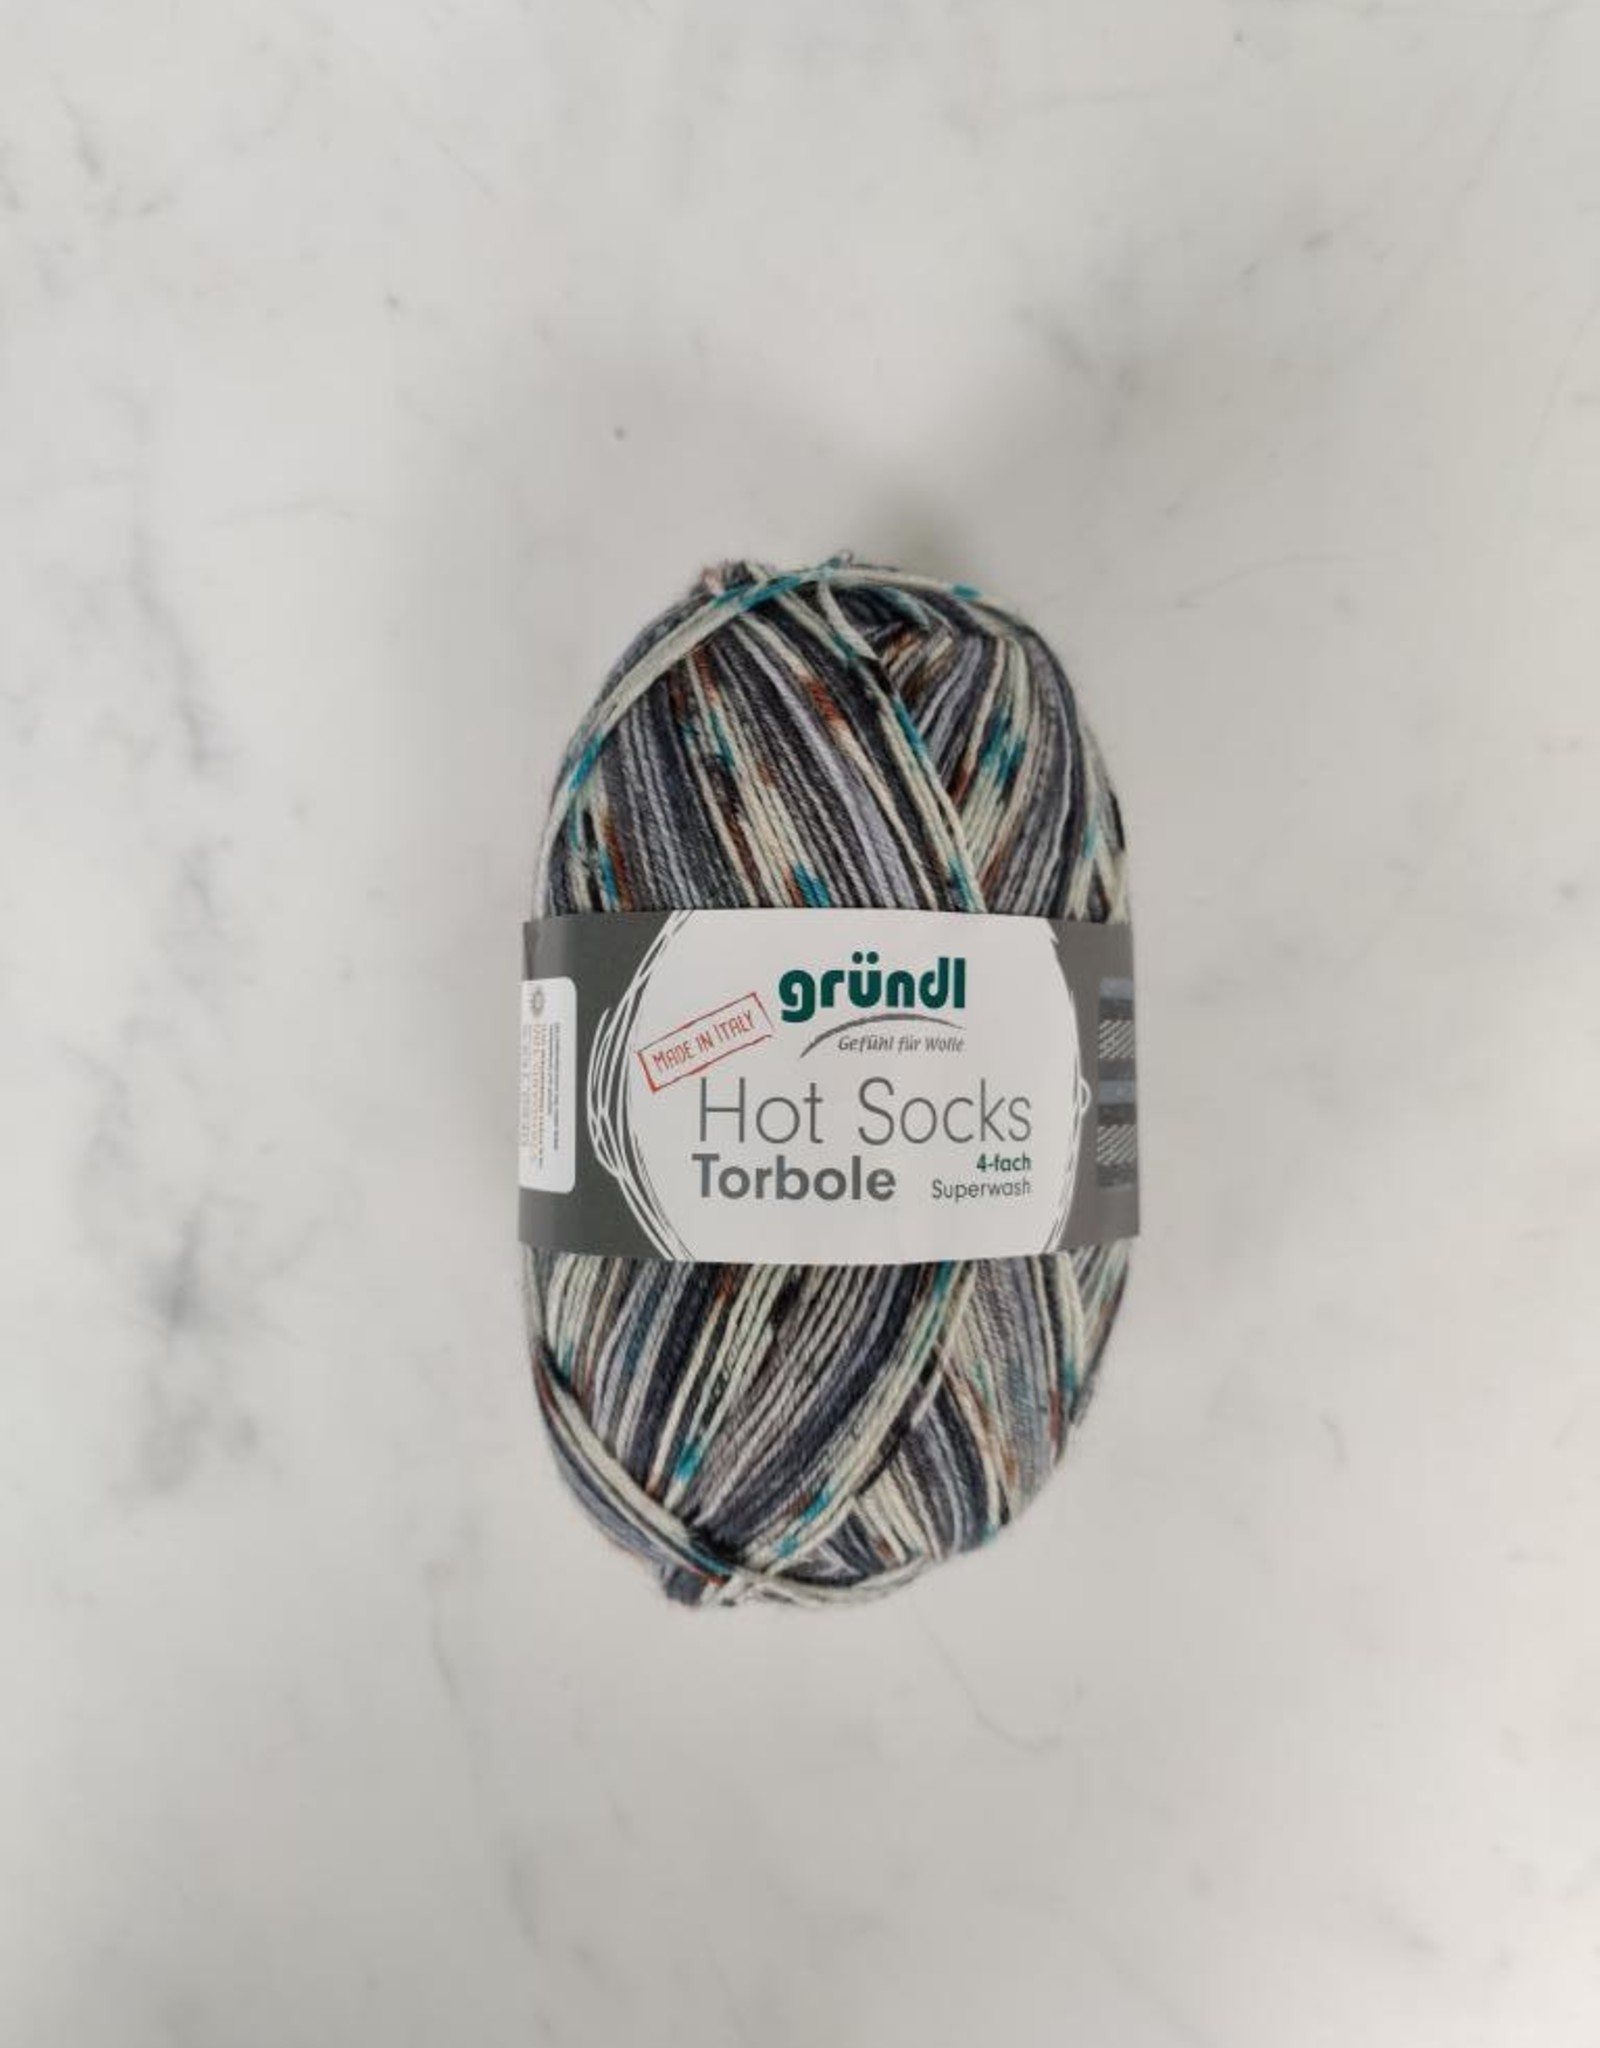 Gründl Gründl - Hot Socks Torbole 1